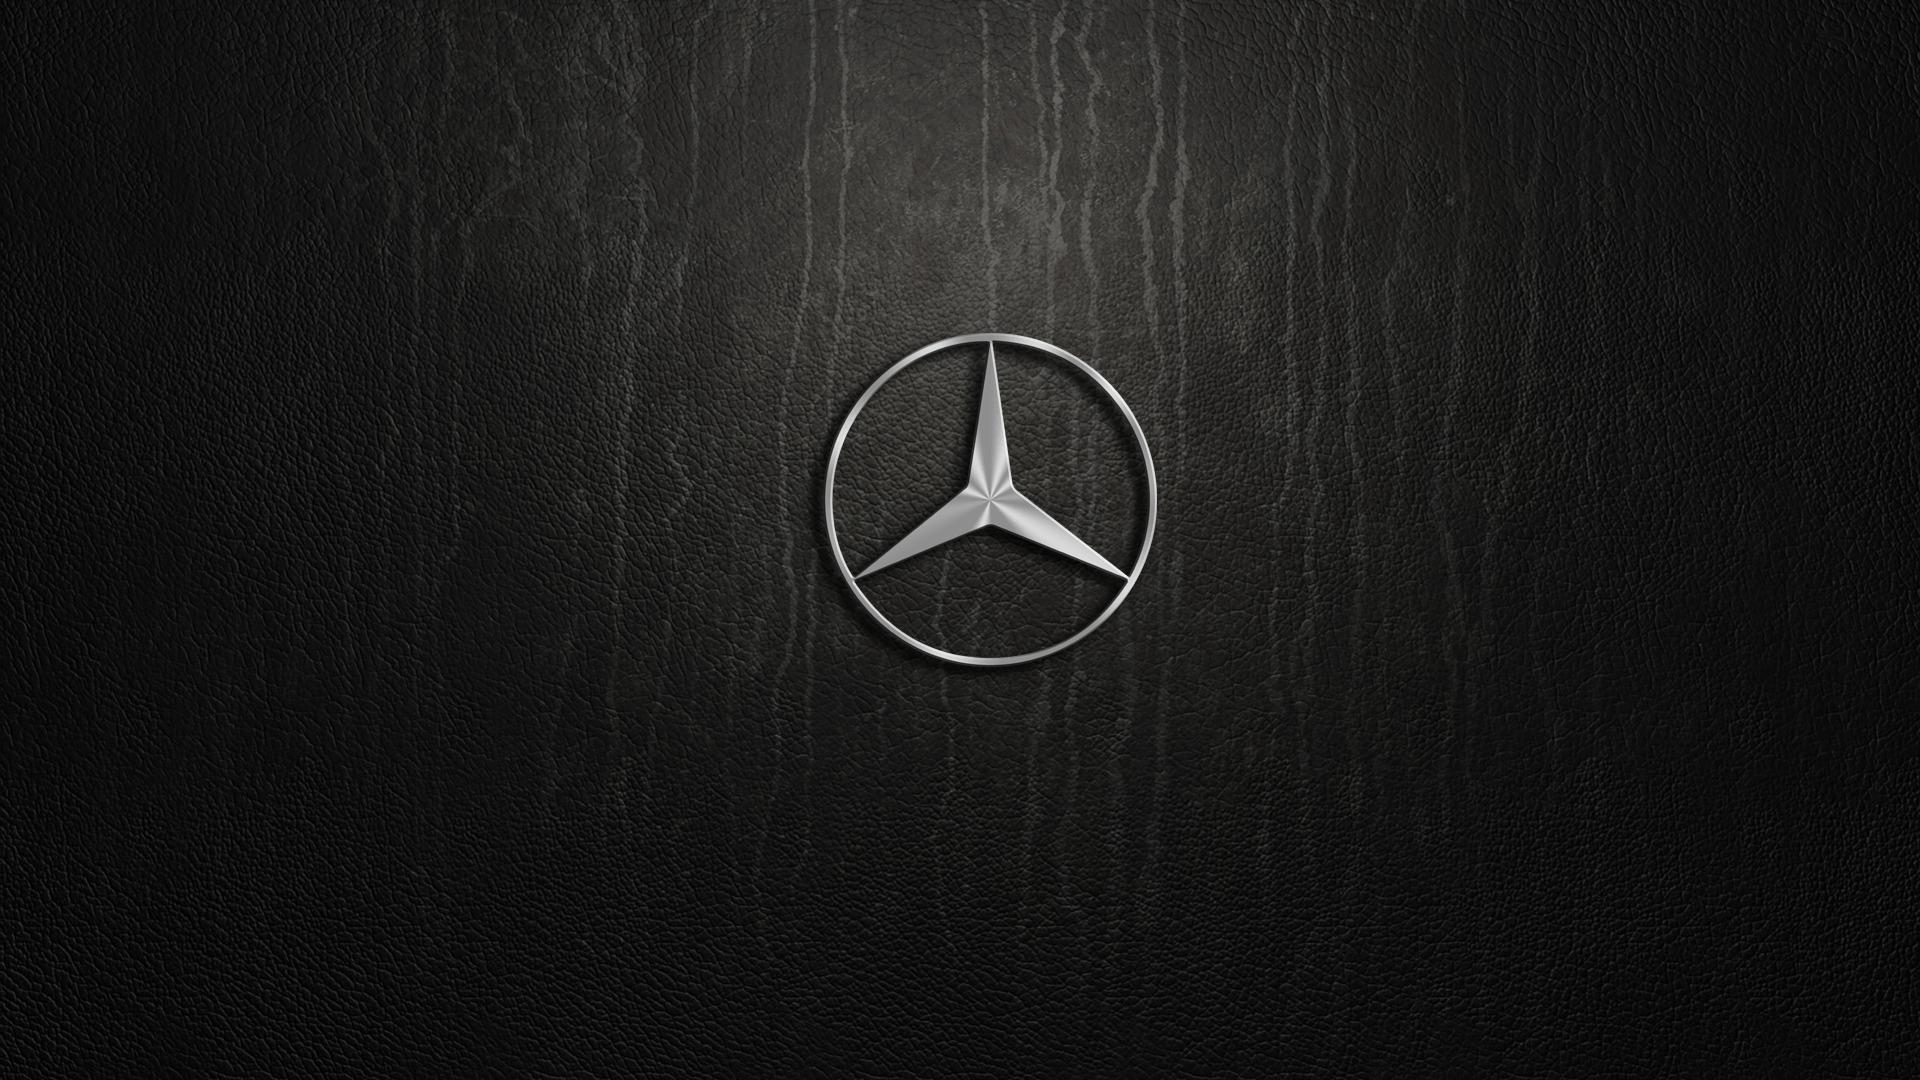 10 Most Popular Mercedes Benz Logo Wallpaper FULL HD 1080p For PC Desktop